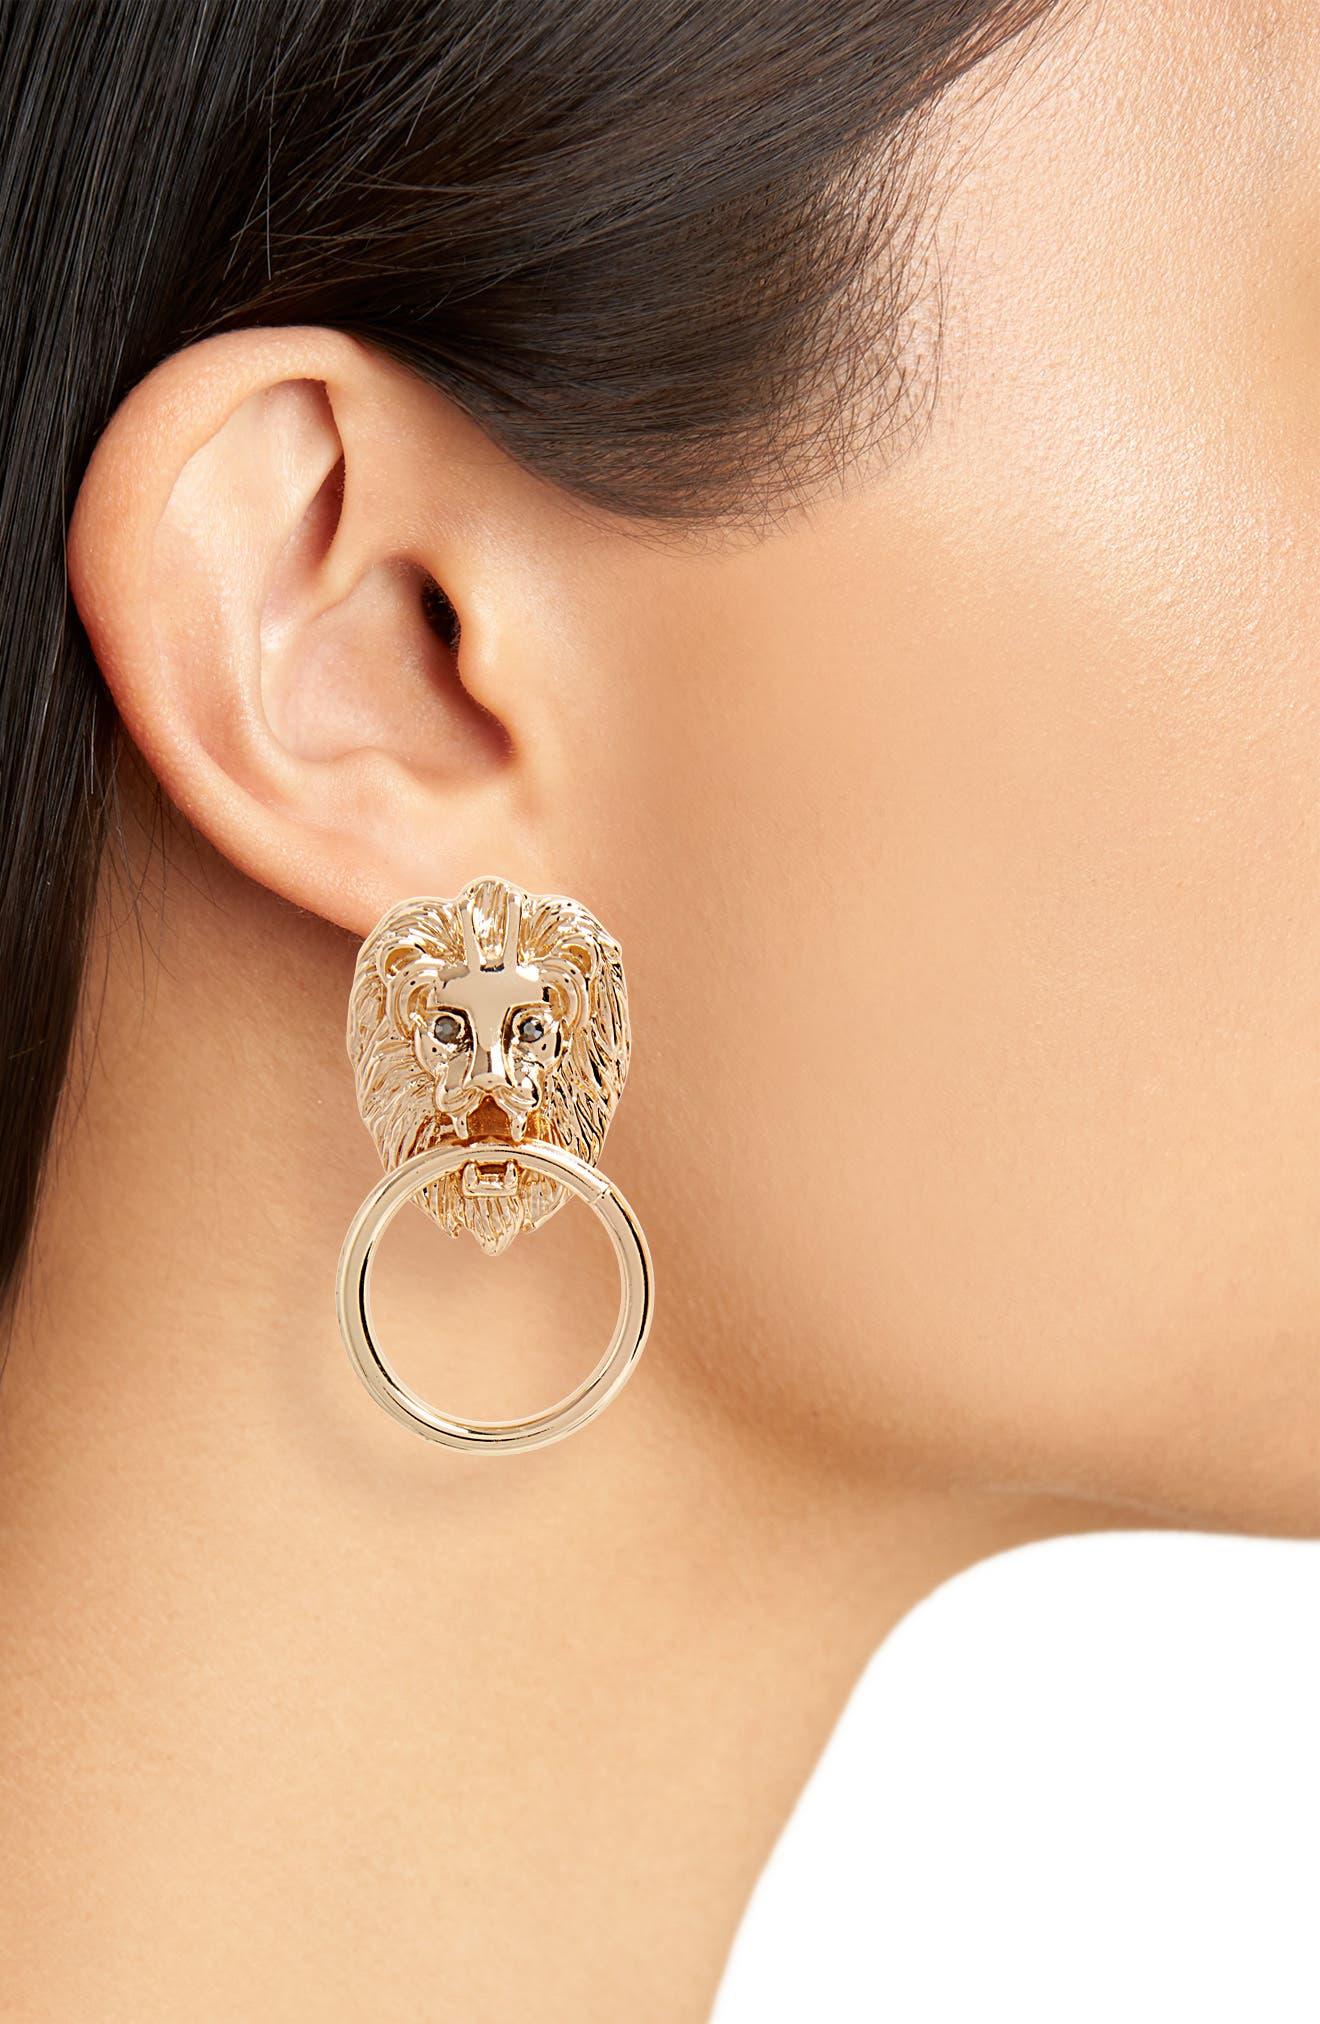 Crystal Lion Doorknocker Earrings,                             Alternate thumbnail 2, color,                             710